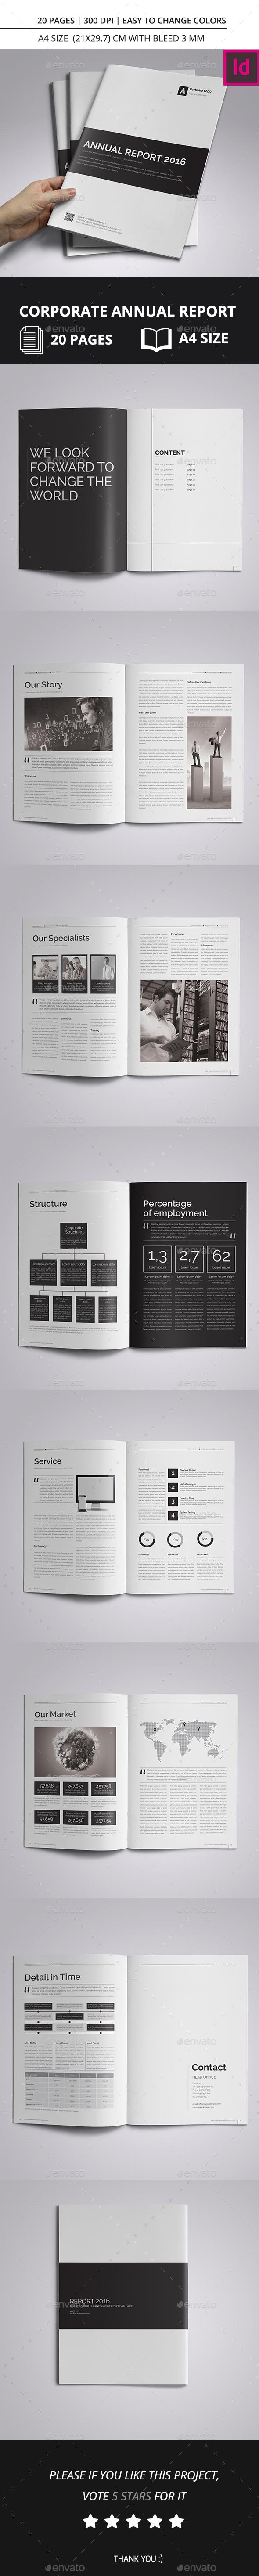 Corporate Annual Report Brochure 2016 A4 - Corporate Brochures